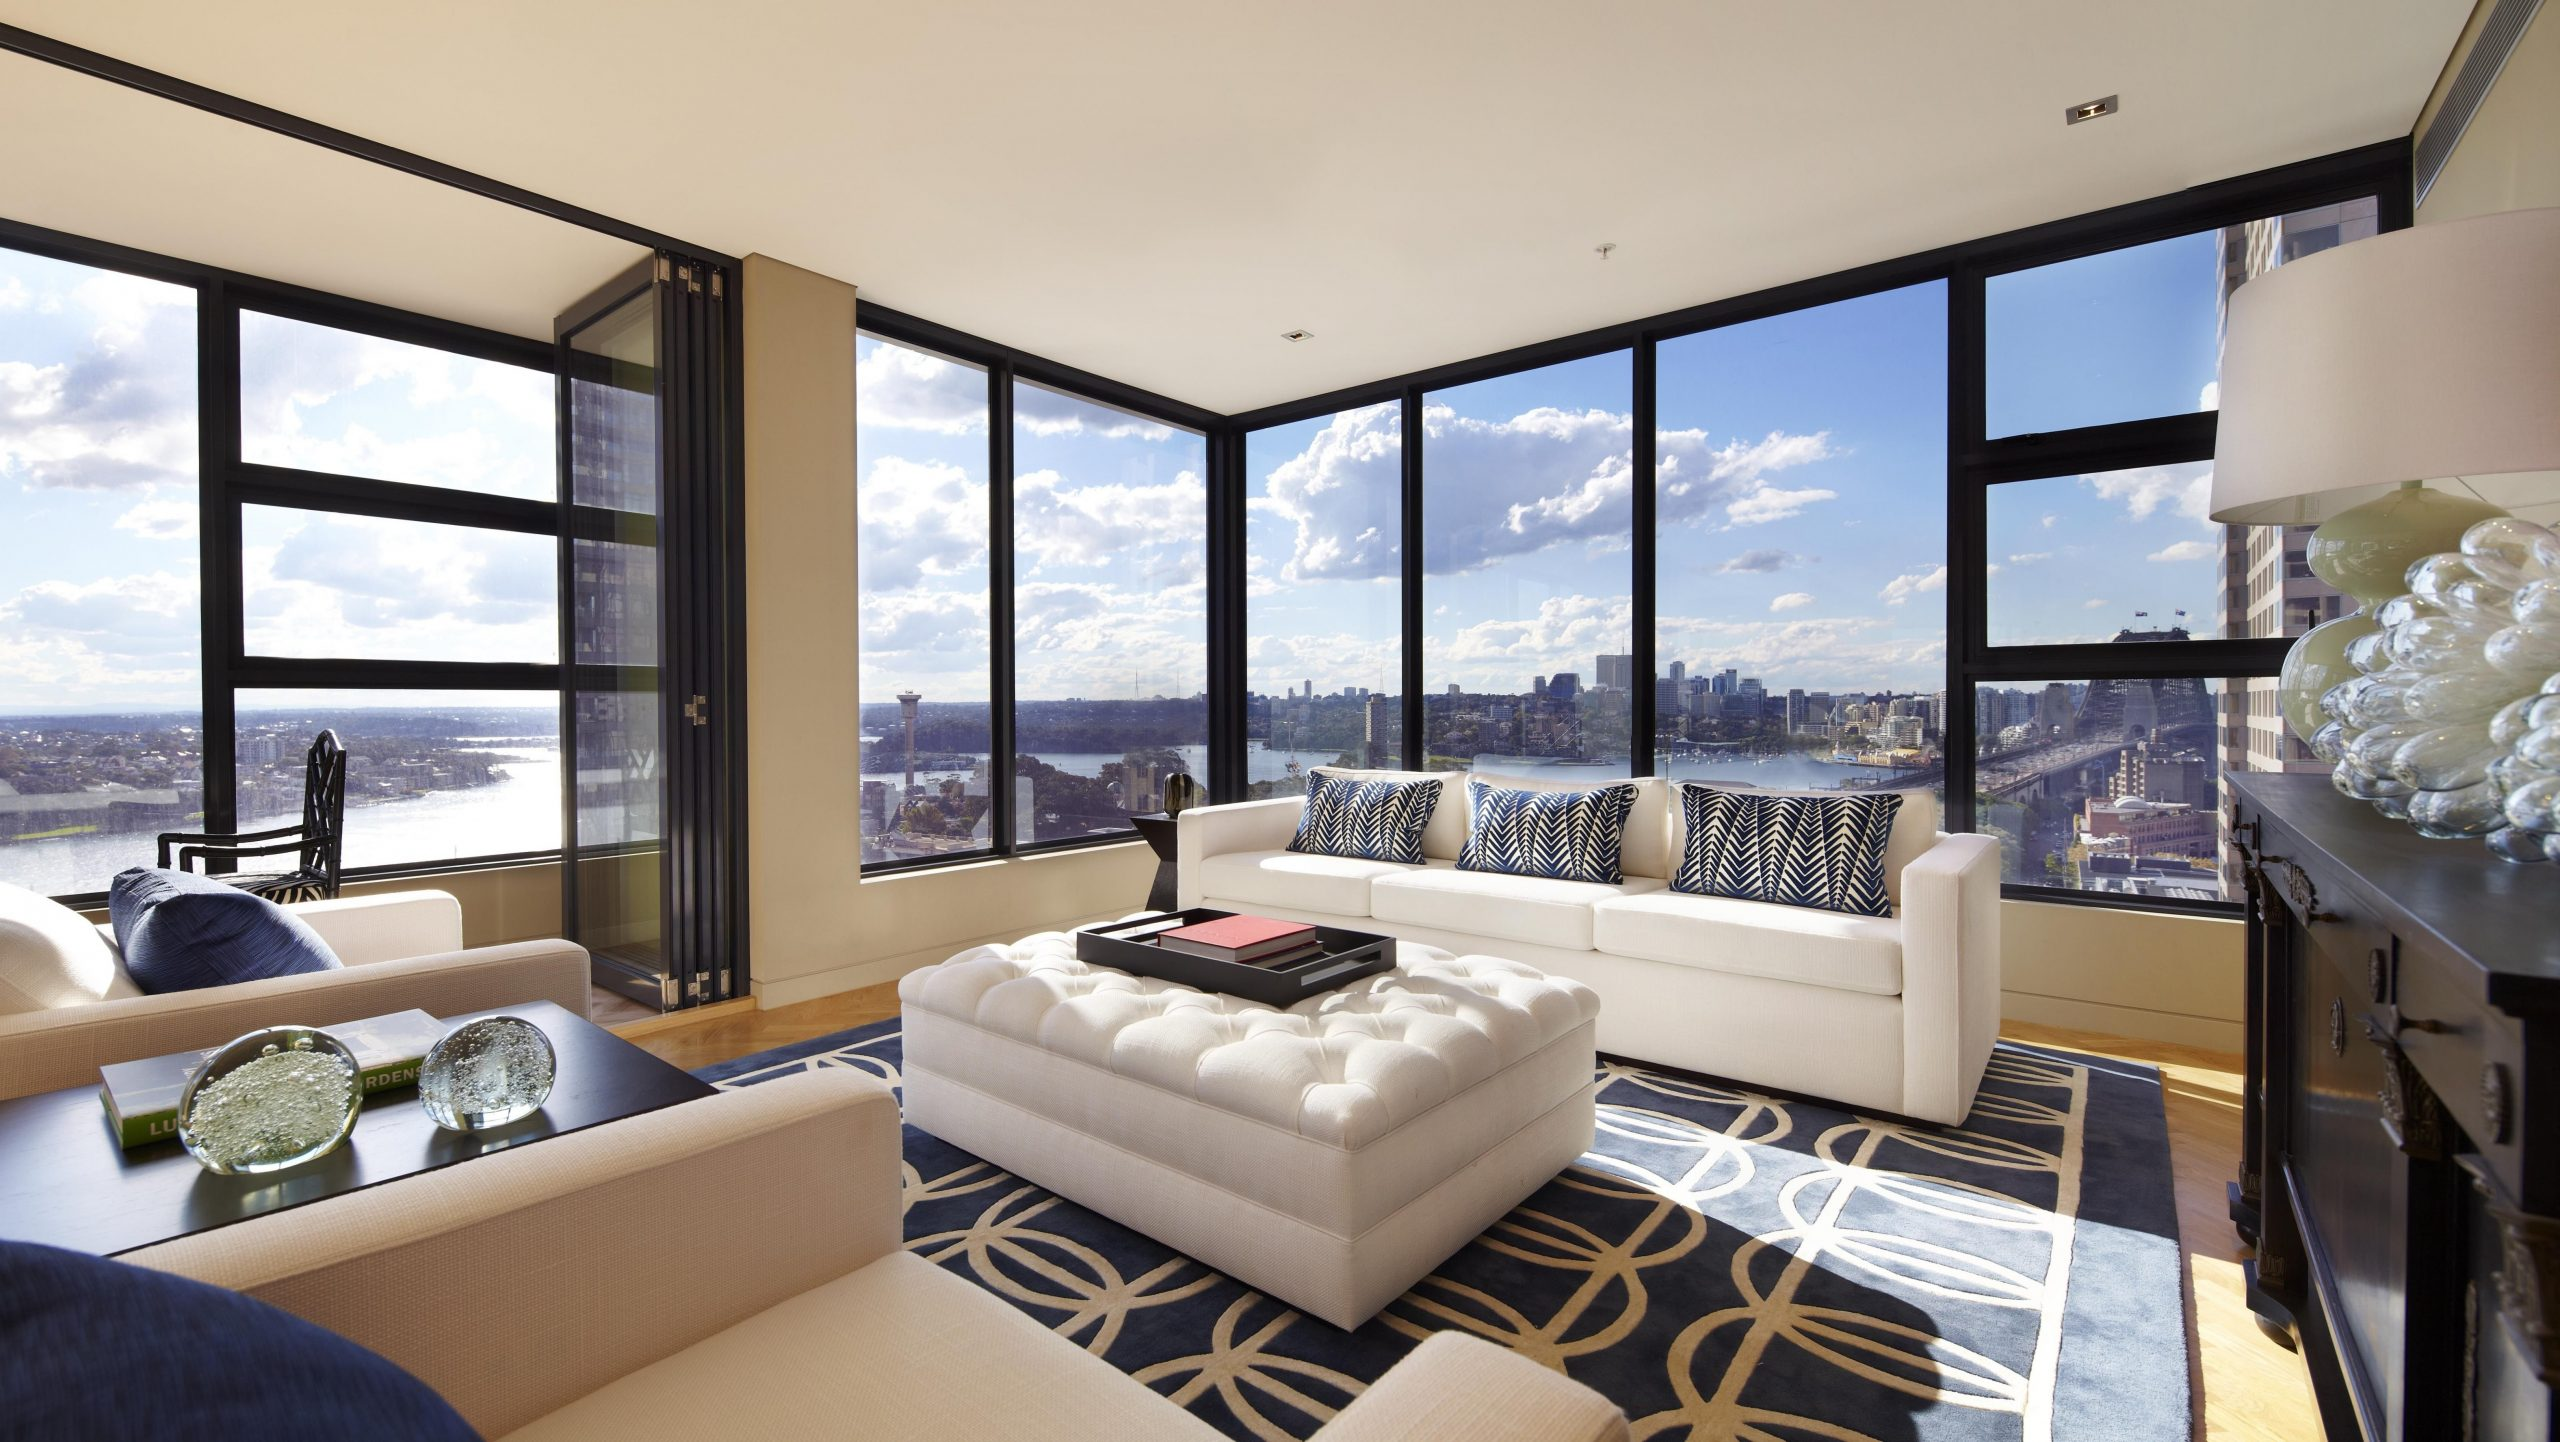 Design Room House Home Apartment Condo 12 Wallpaper - Best Luxury  - Apartment Design Hd